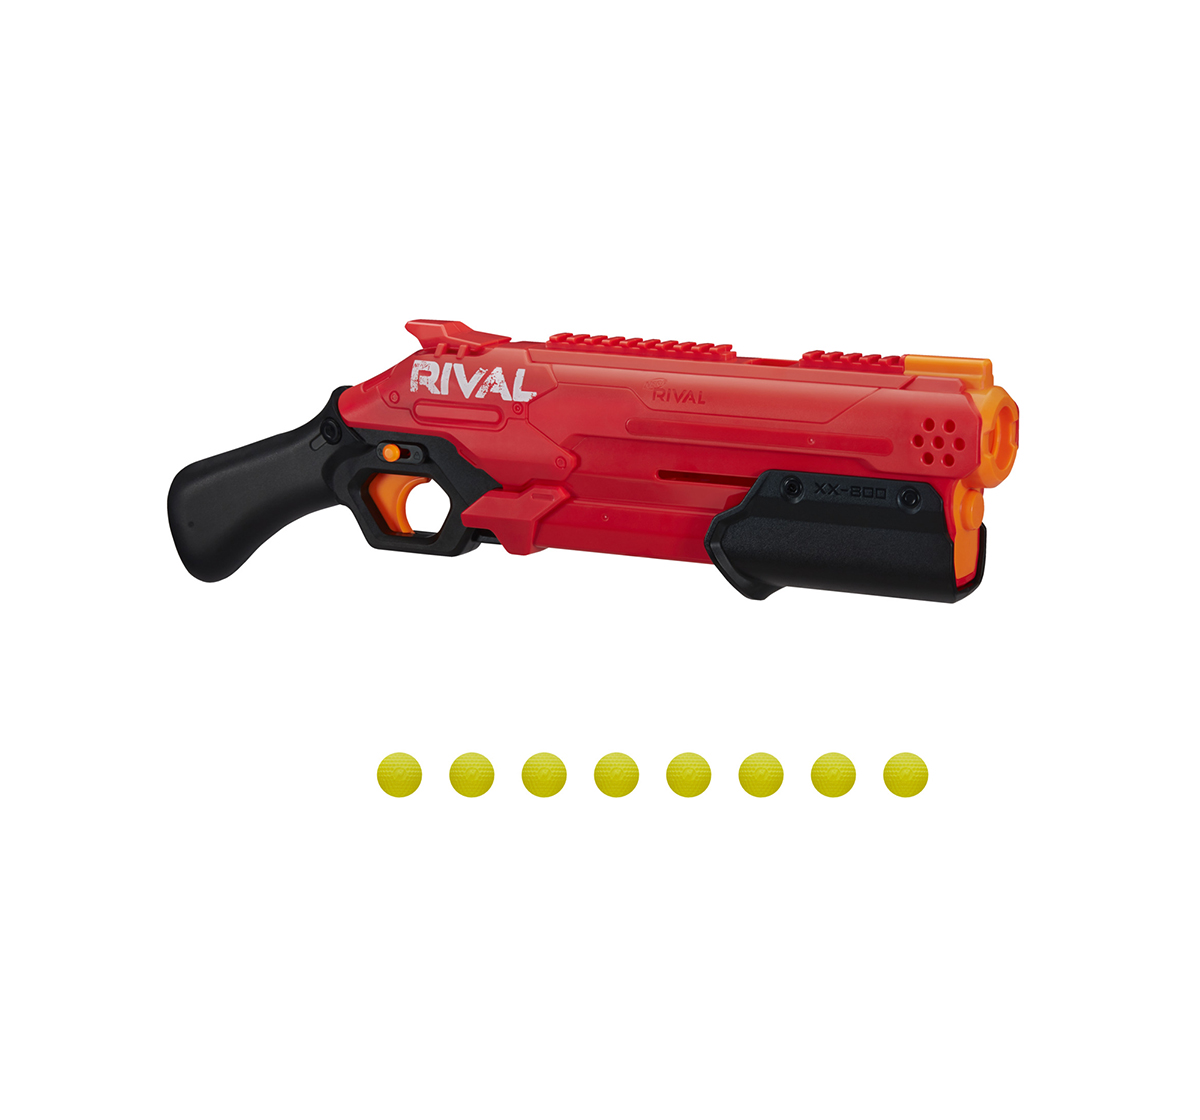 Nerf | Nerf Rival Takedown XX-800 Blaster Toy Gun Blasters for Kids age 14Y+